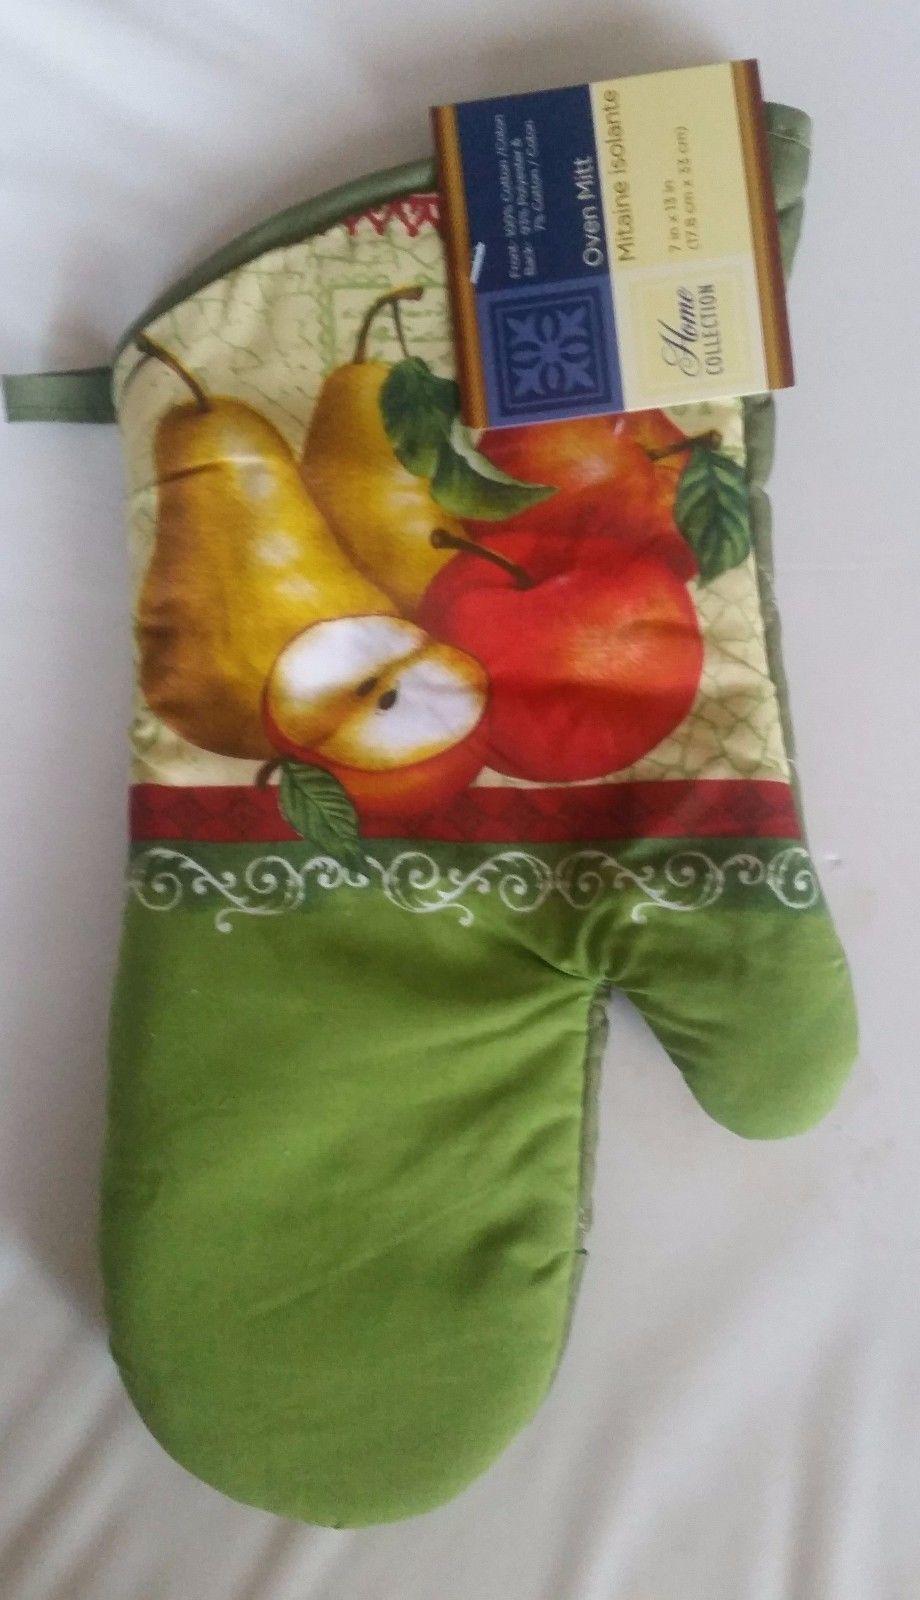 "Fabric Printed Kitchen 13"" Jumbo Oven Mitt, FRUITS, PEARS & APPLES - $7.91"